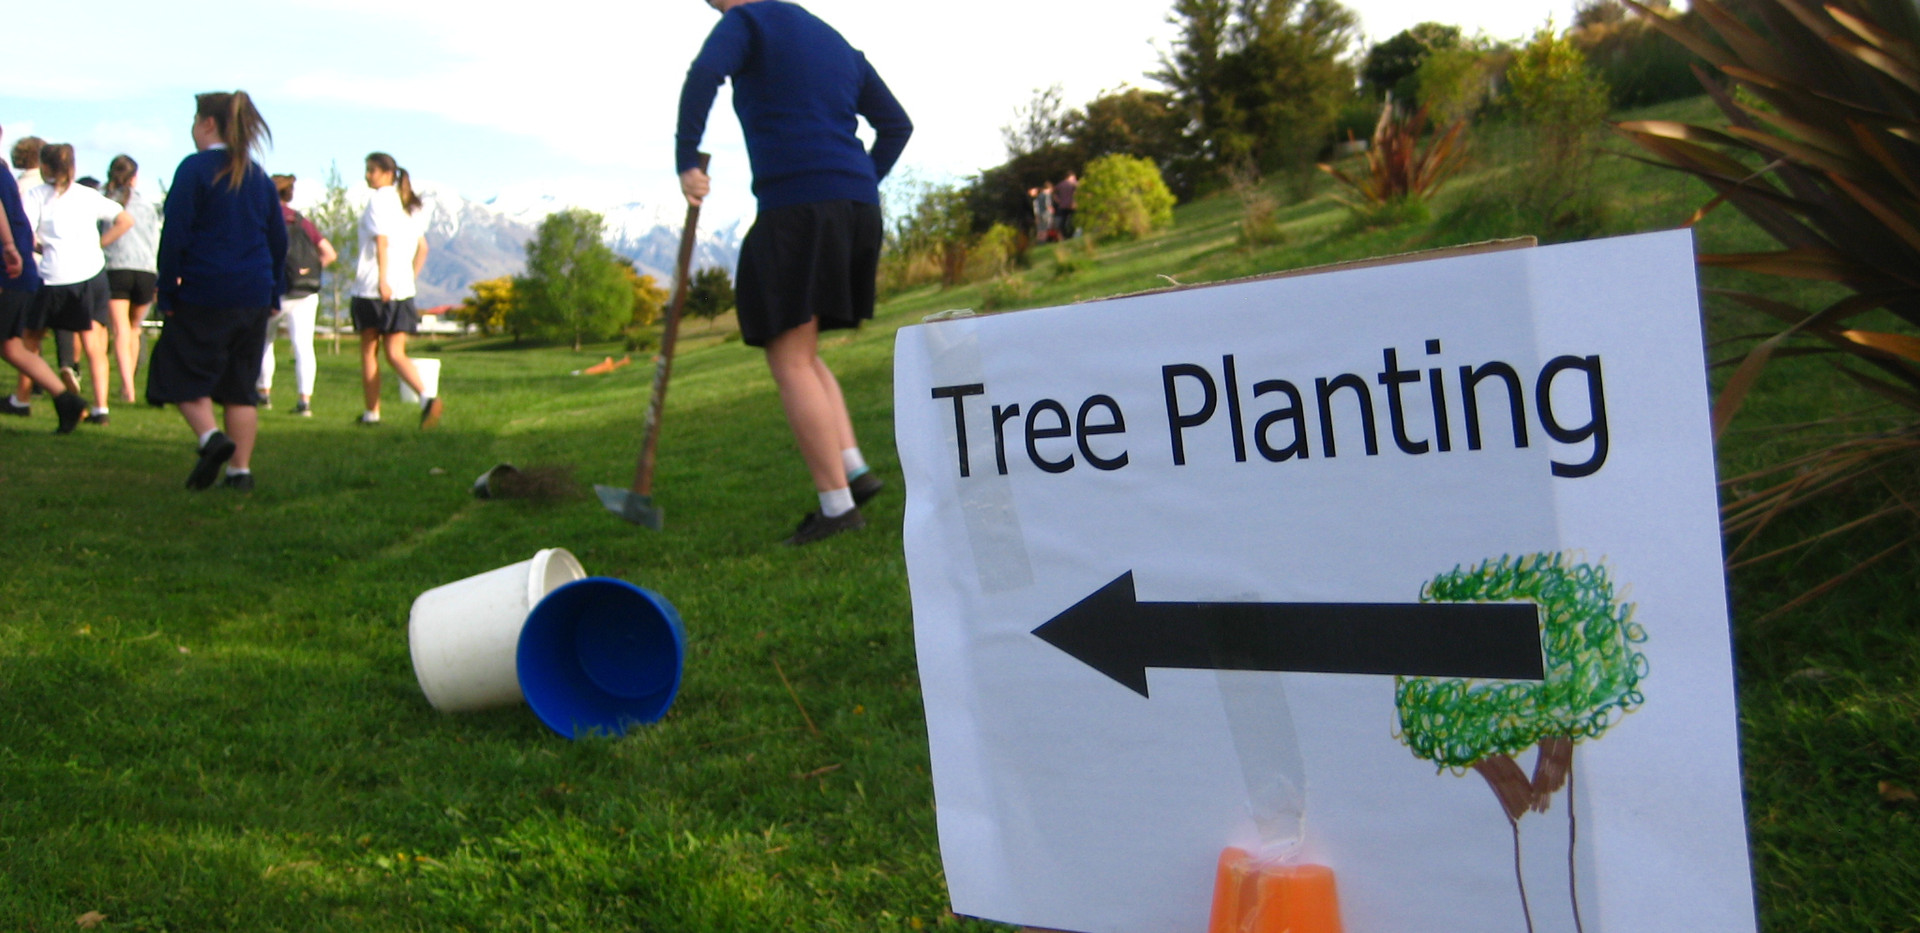 Tree planting 16 Oct 2015 (23).JPG